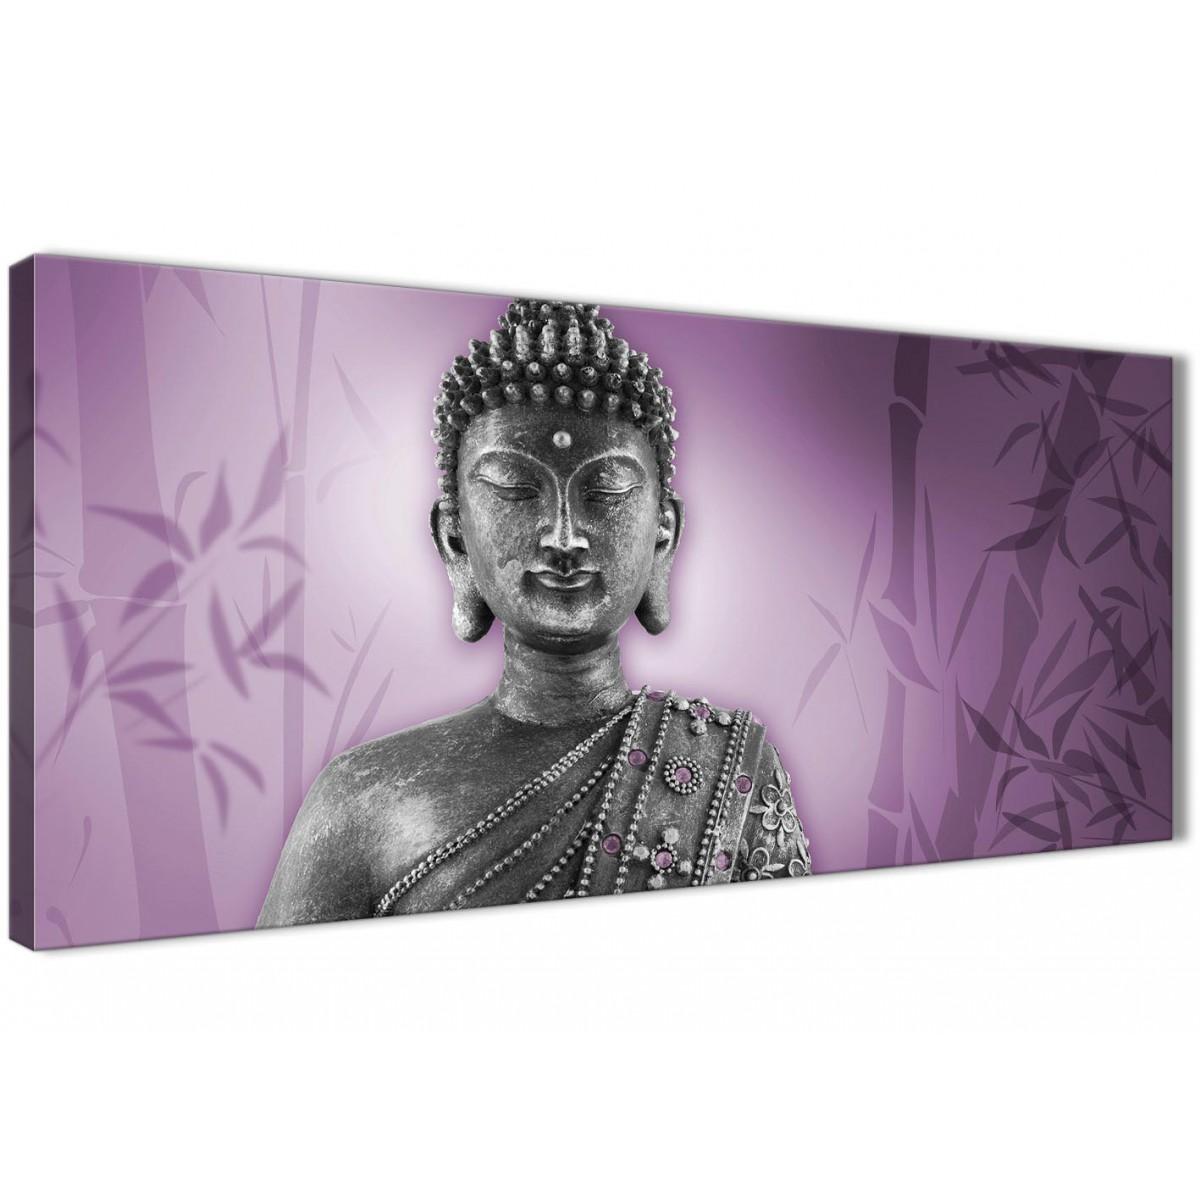 Purple And Grey Silver Canvas Art Prints Of Buddha